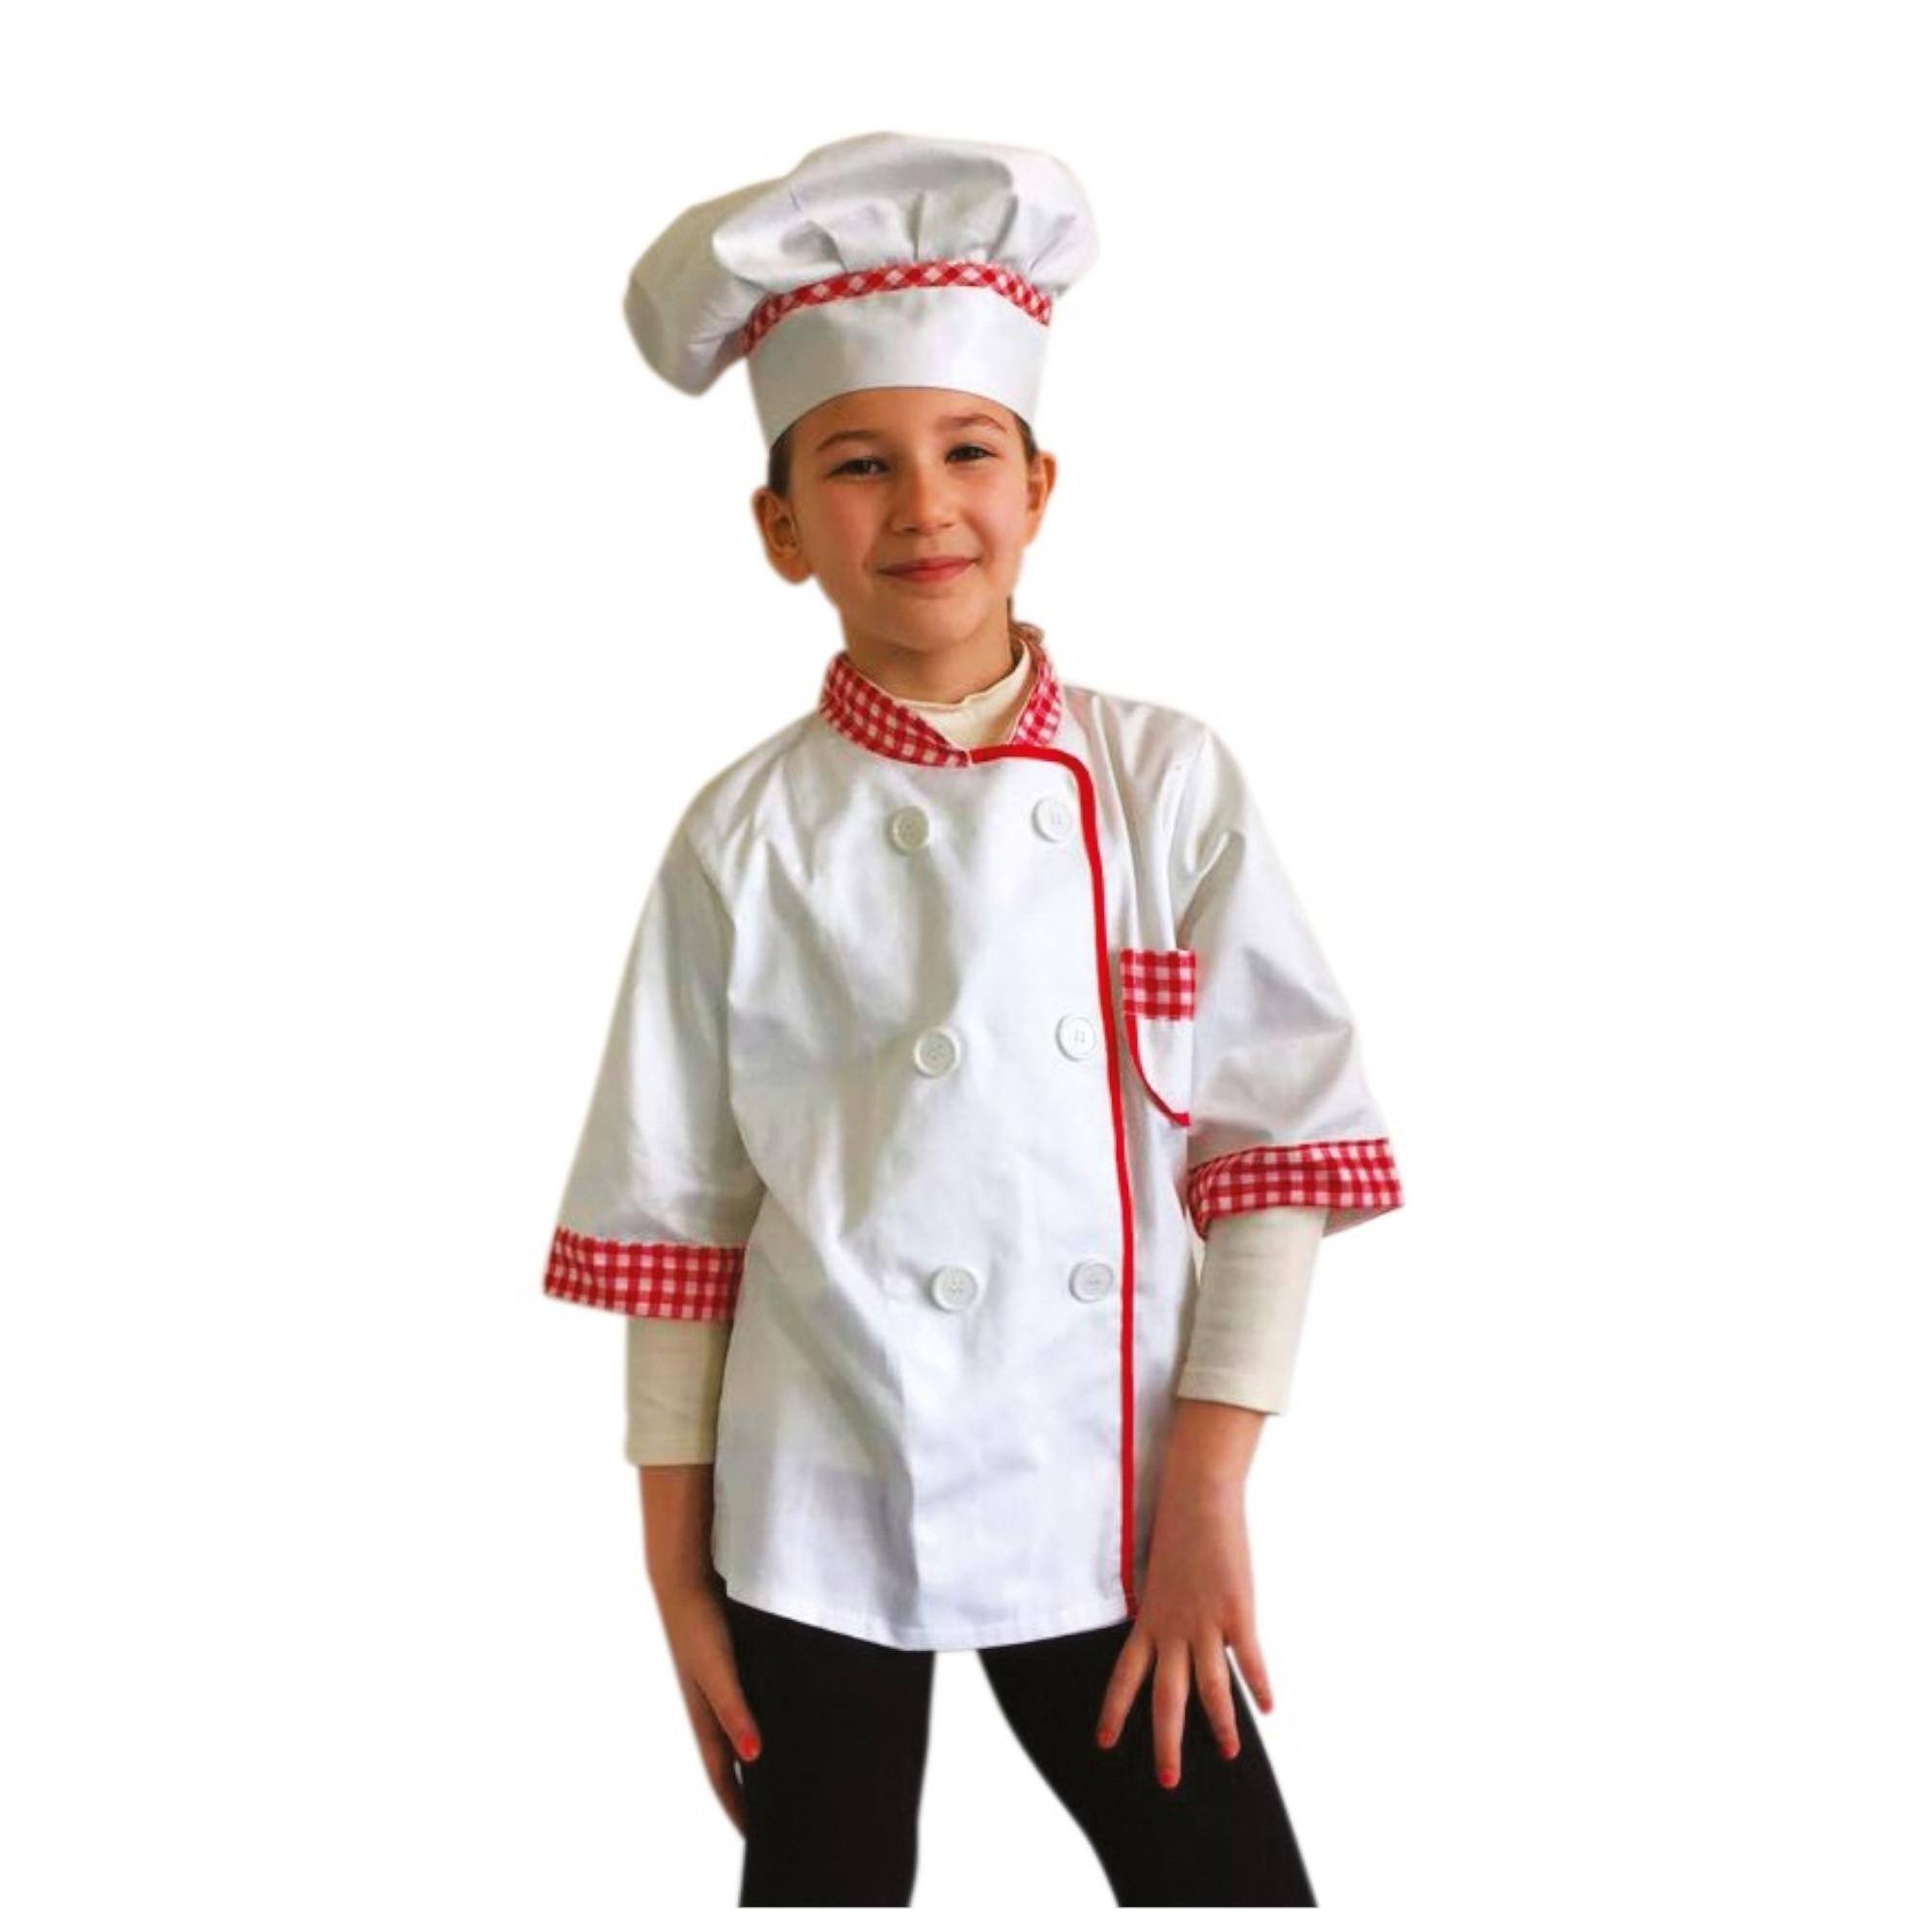 Funny home giacca e cappello da chef - FUNNY HOME